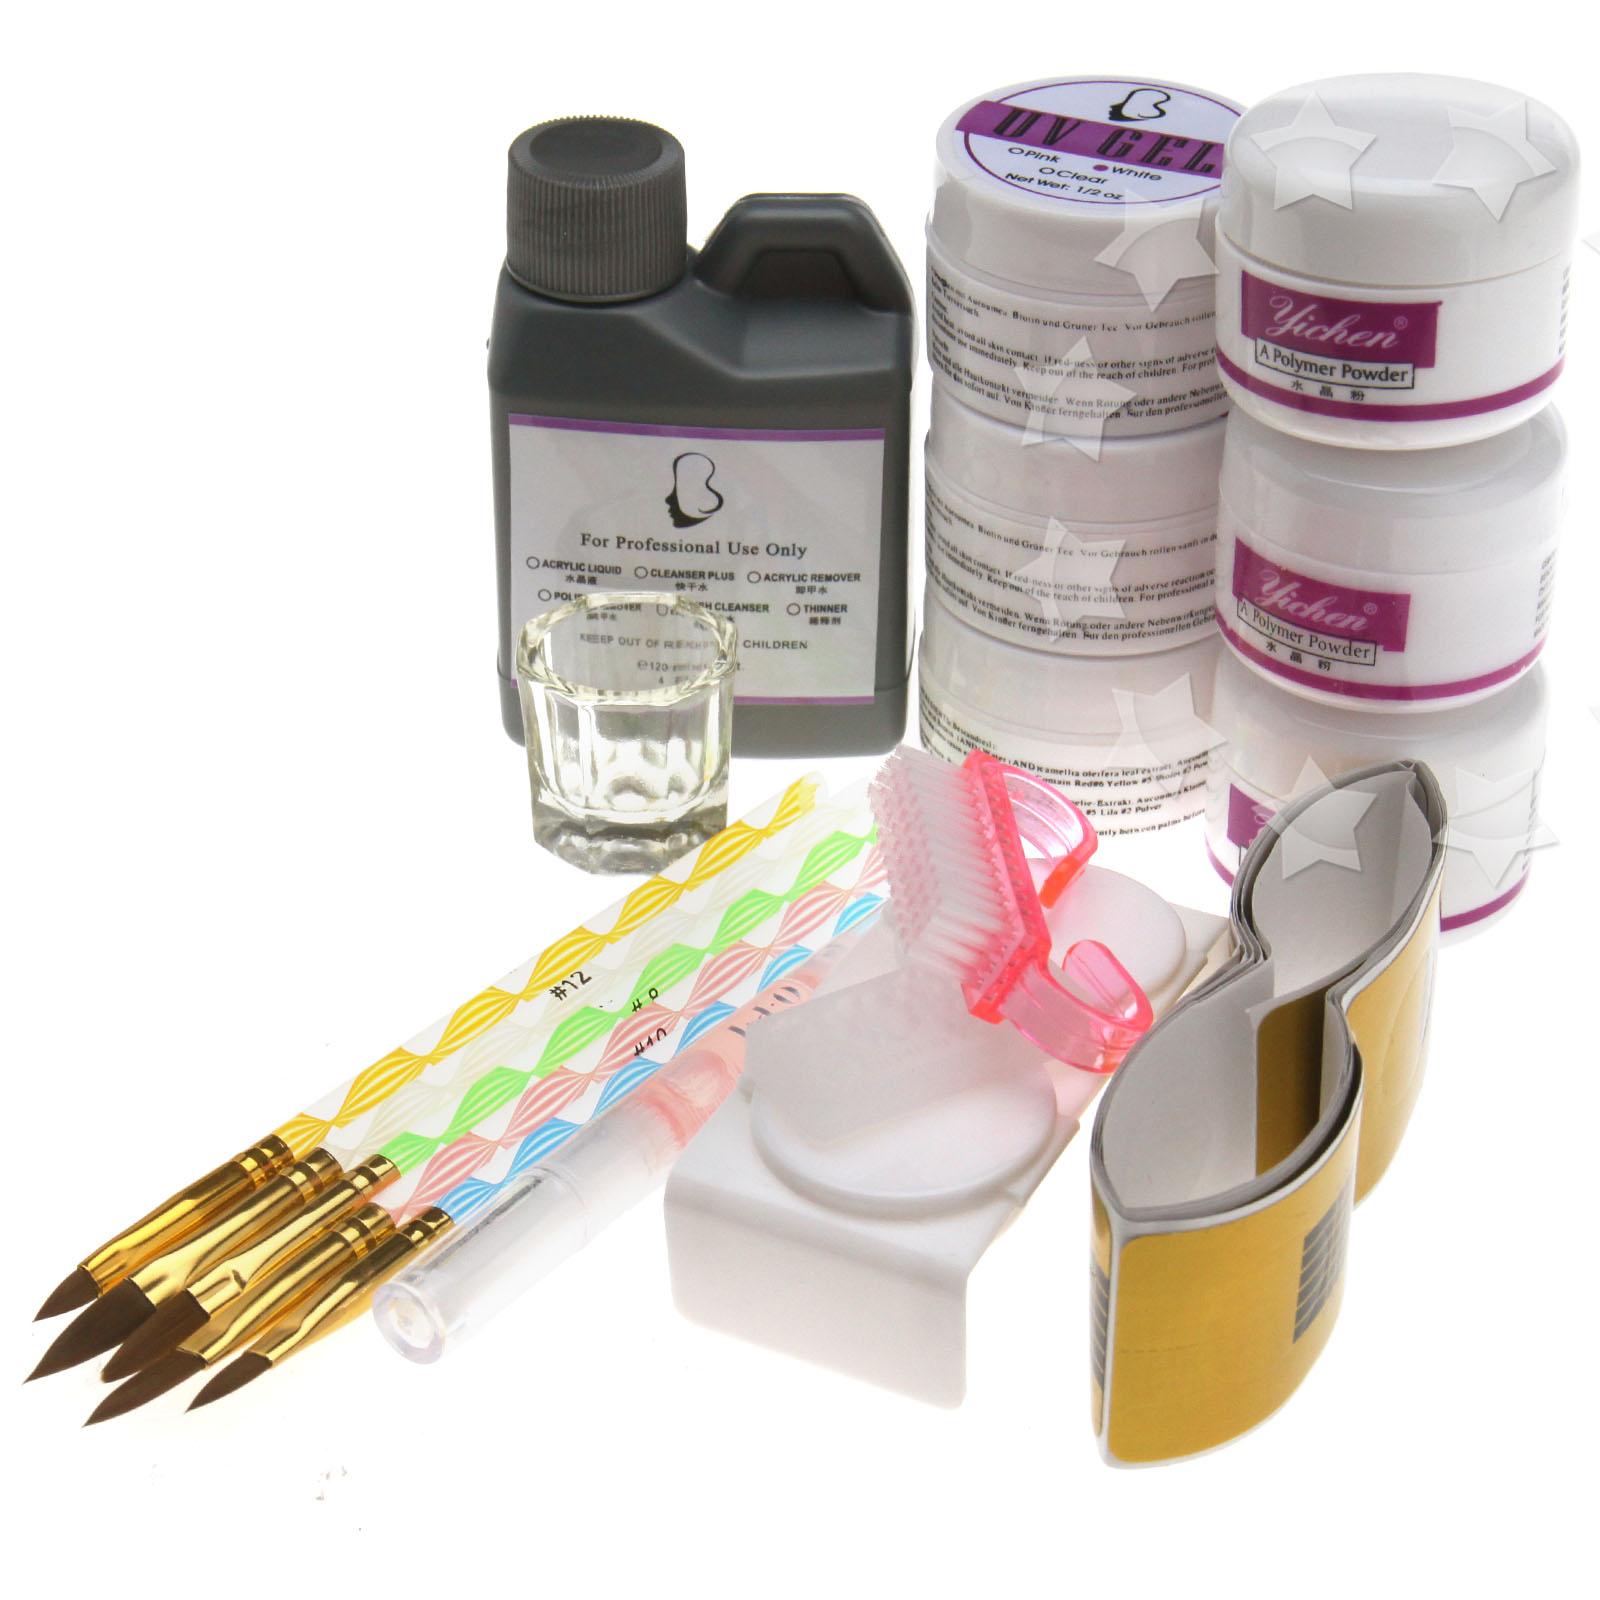 Brush On Nail Gel: Acrylic UV Gel Nail Art Kit With UV Gel Acrylic Powder